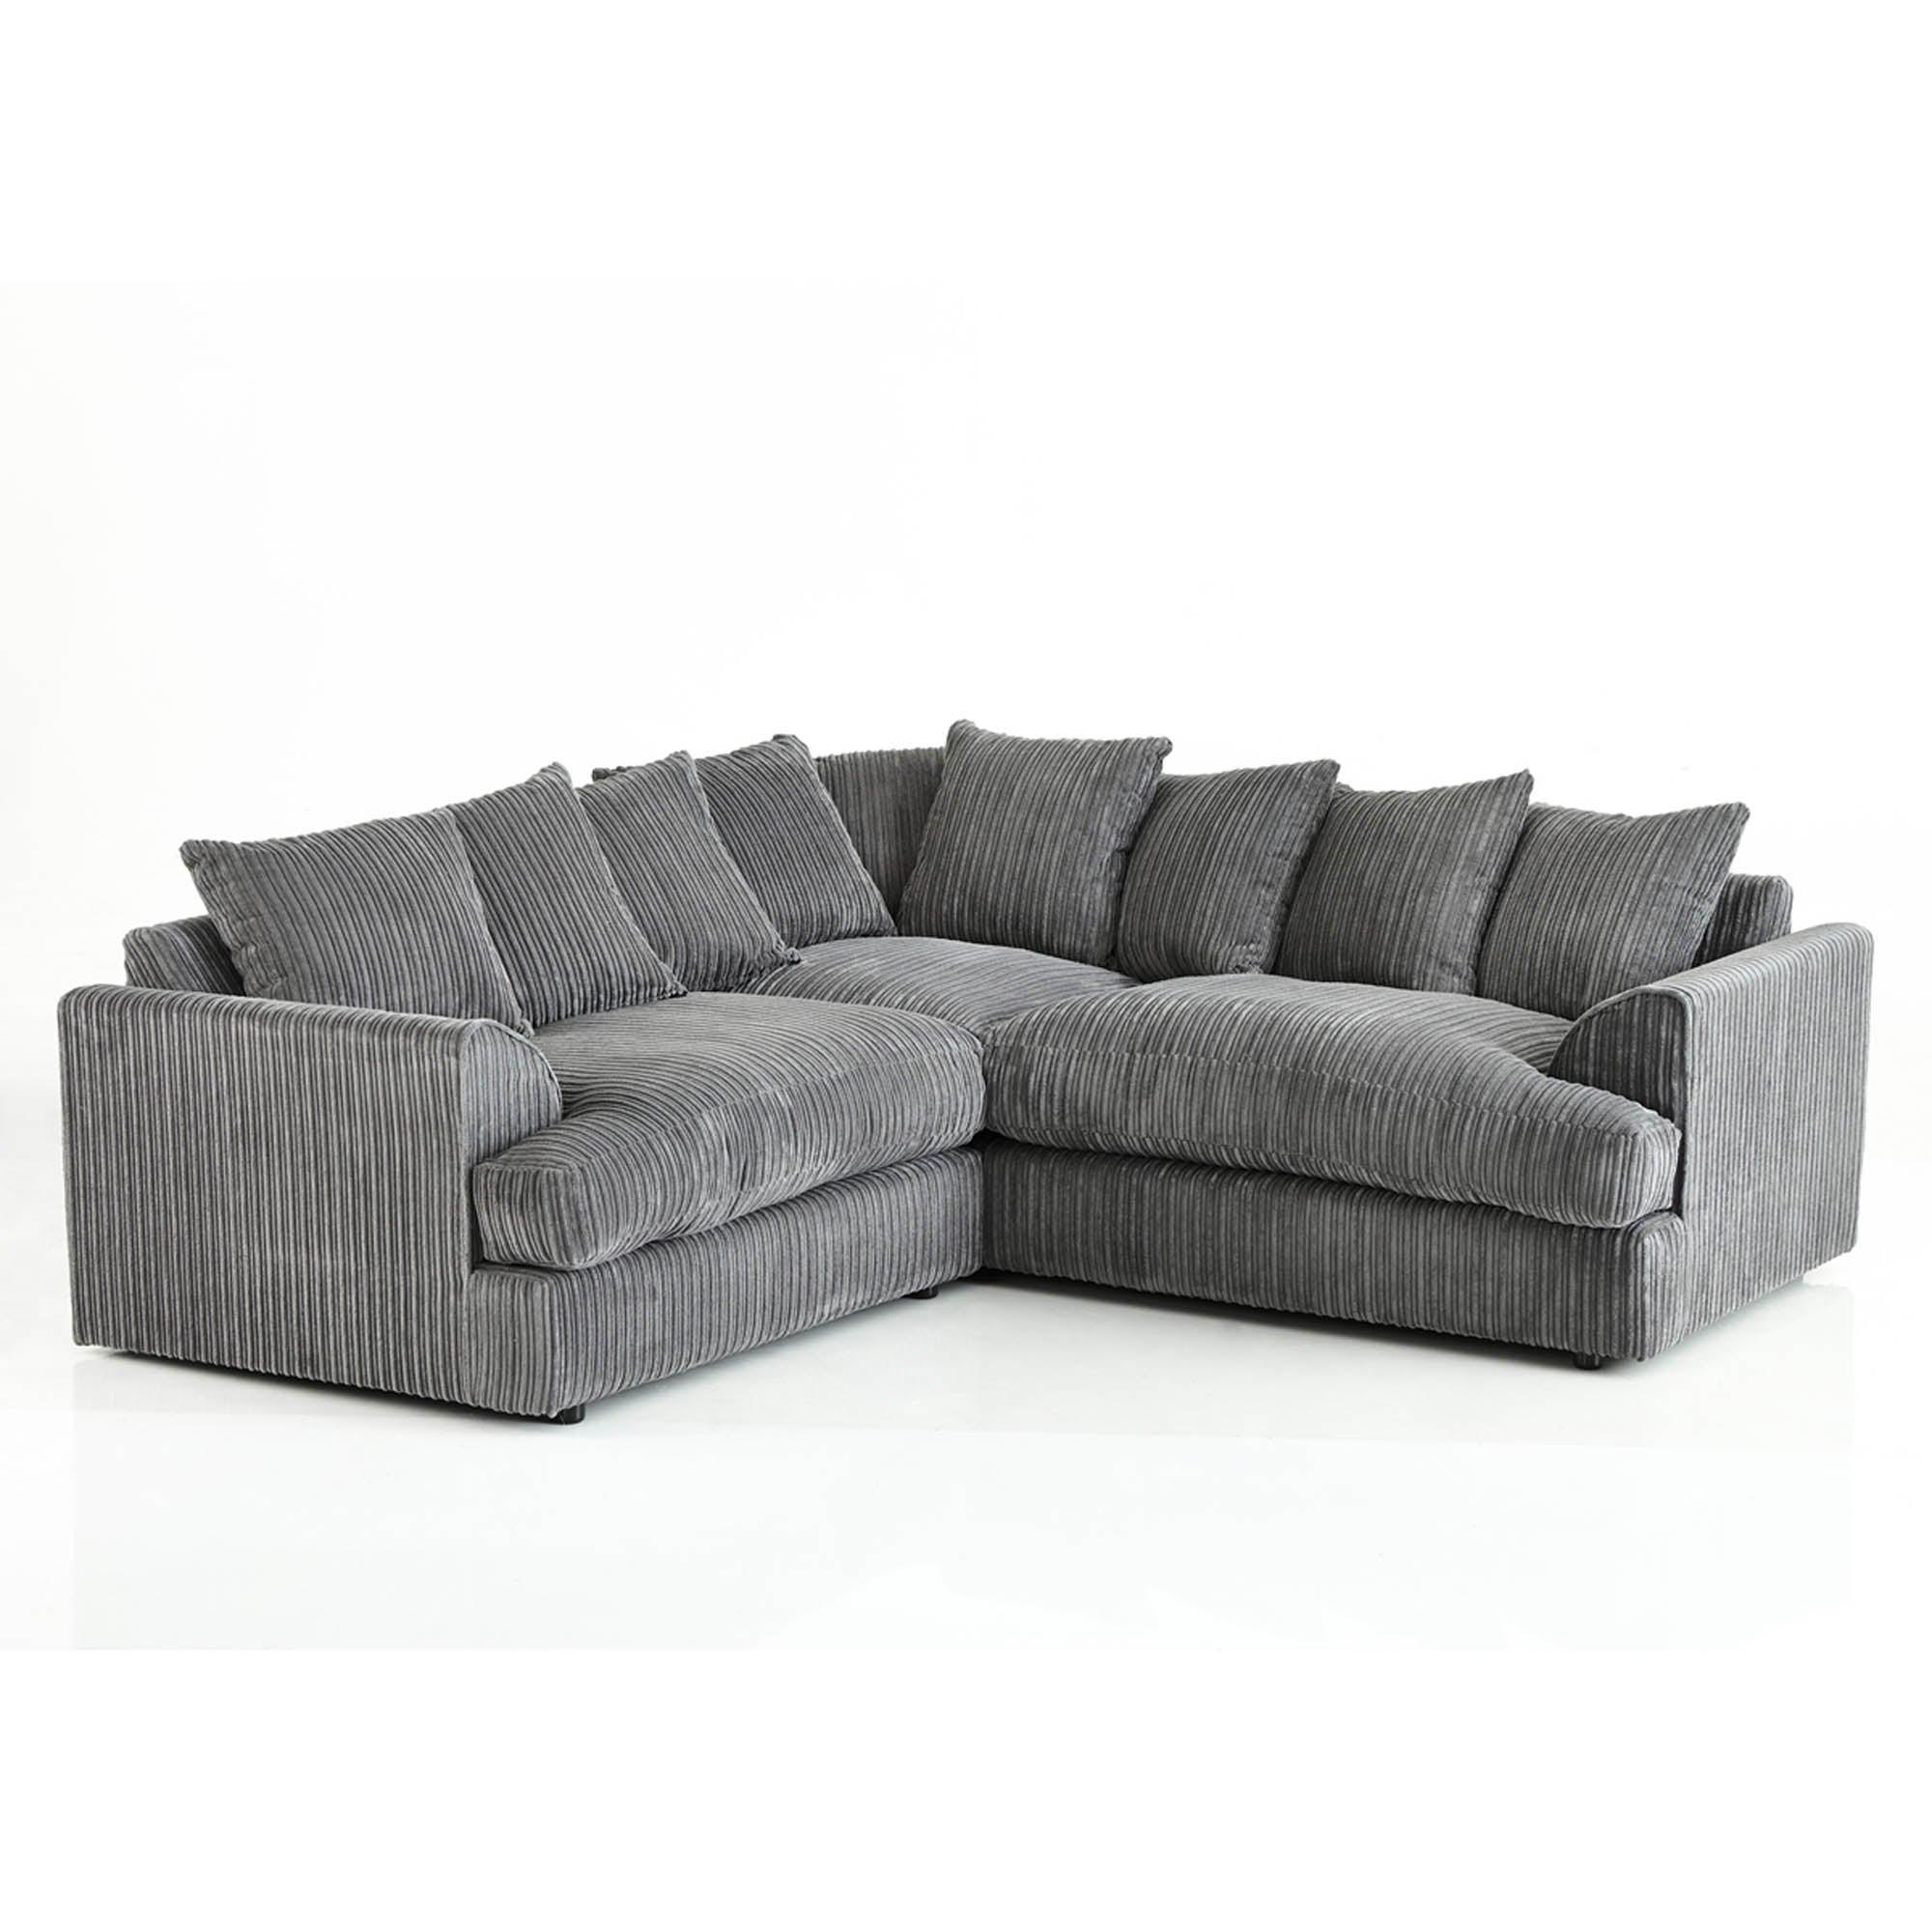 Jasper Large Corner Sofa Black